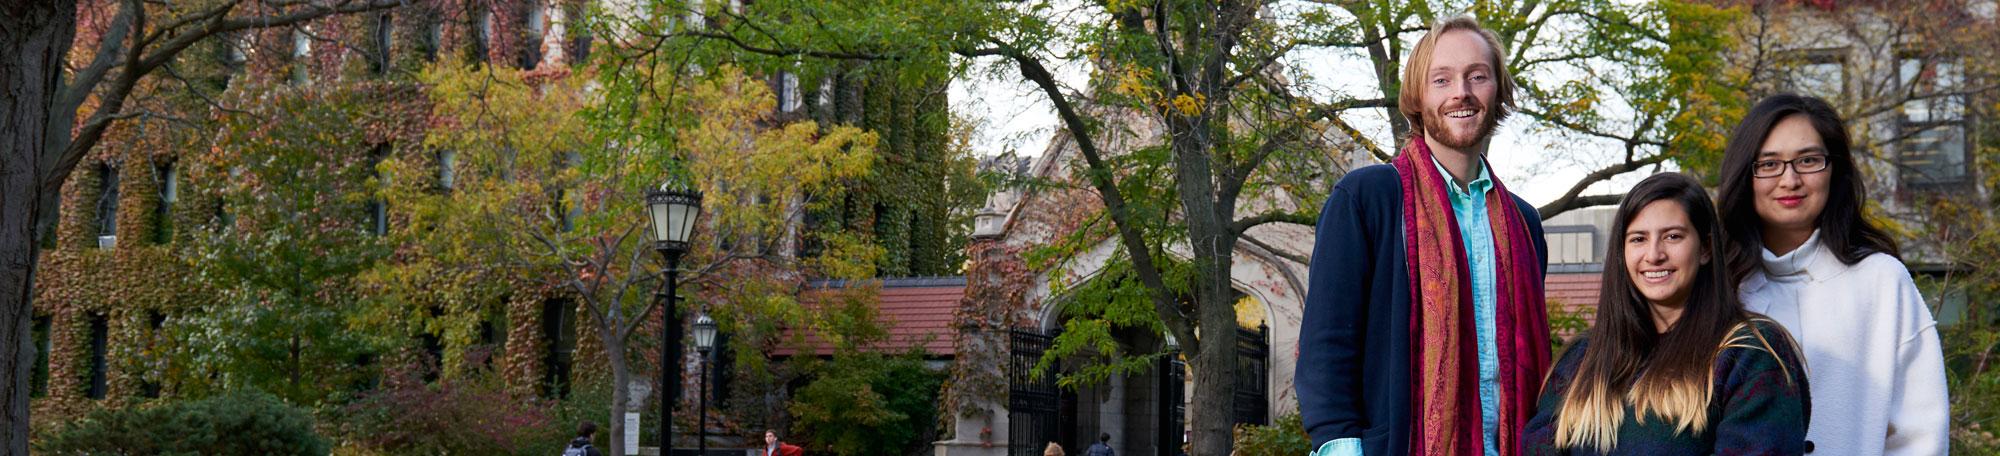 Graduate students on UChIcago campus